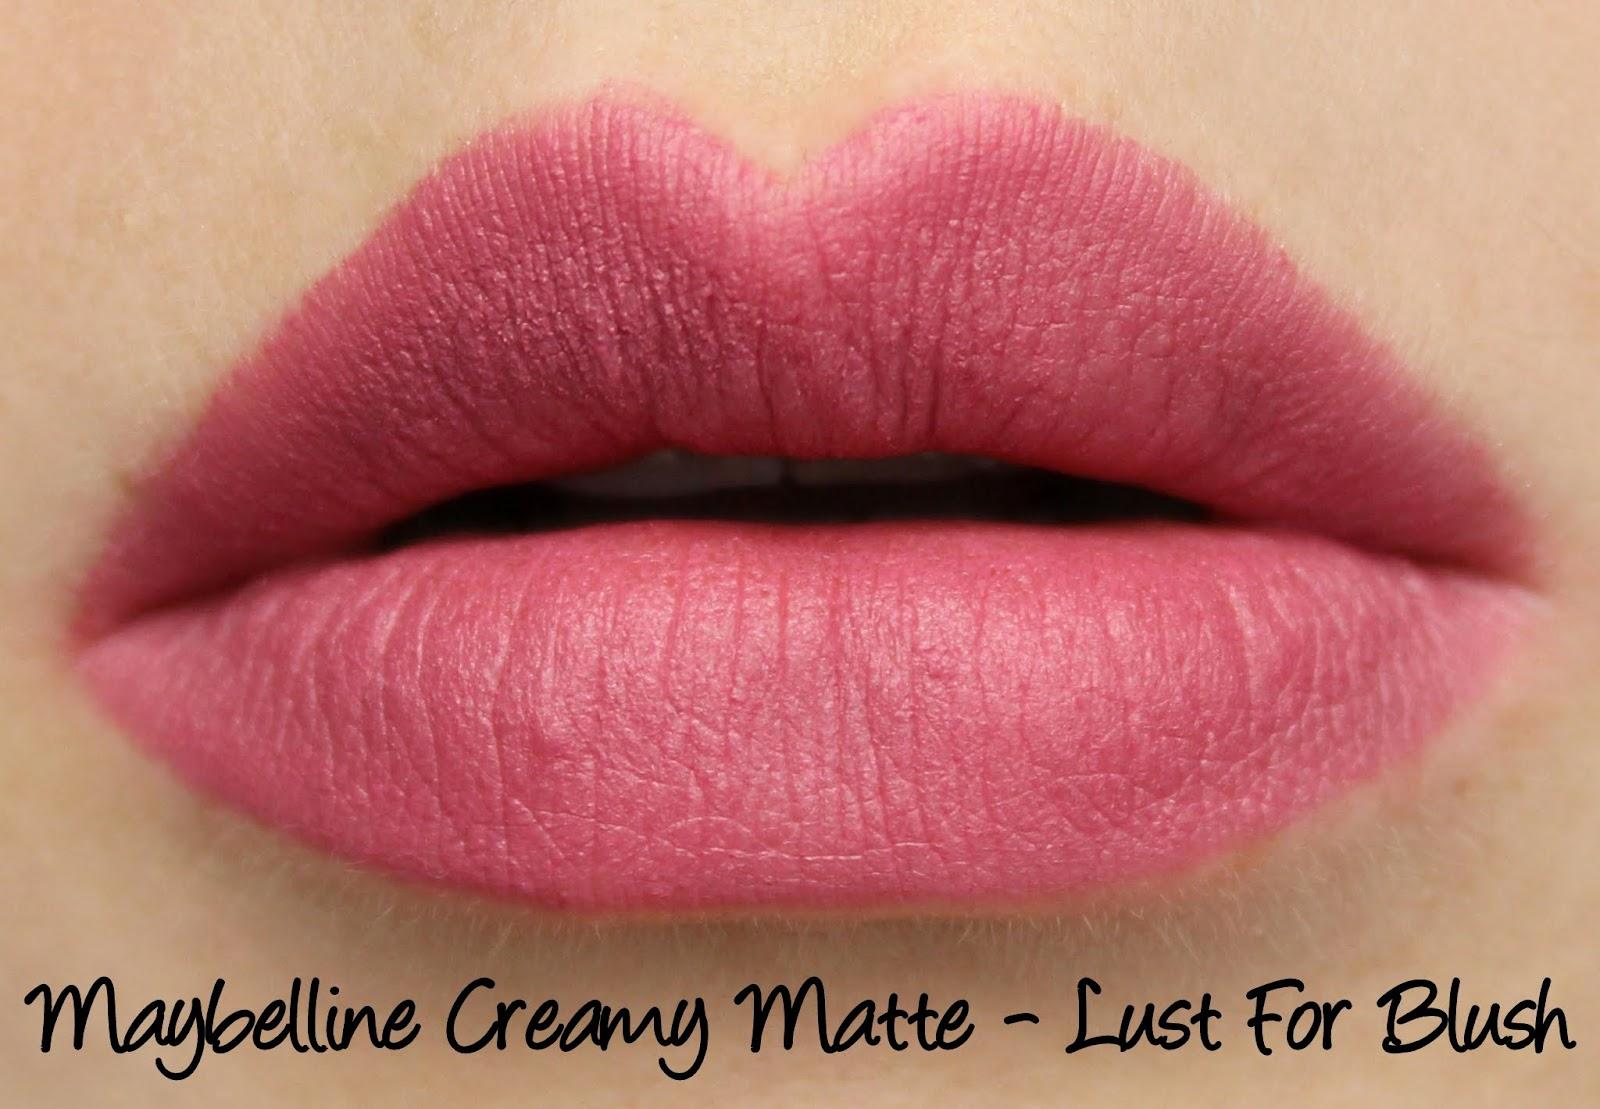 Maybelline Colorsensational Creamy Matte Lipsticks - Lust -9134